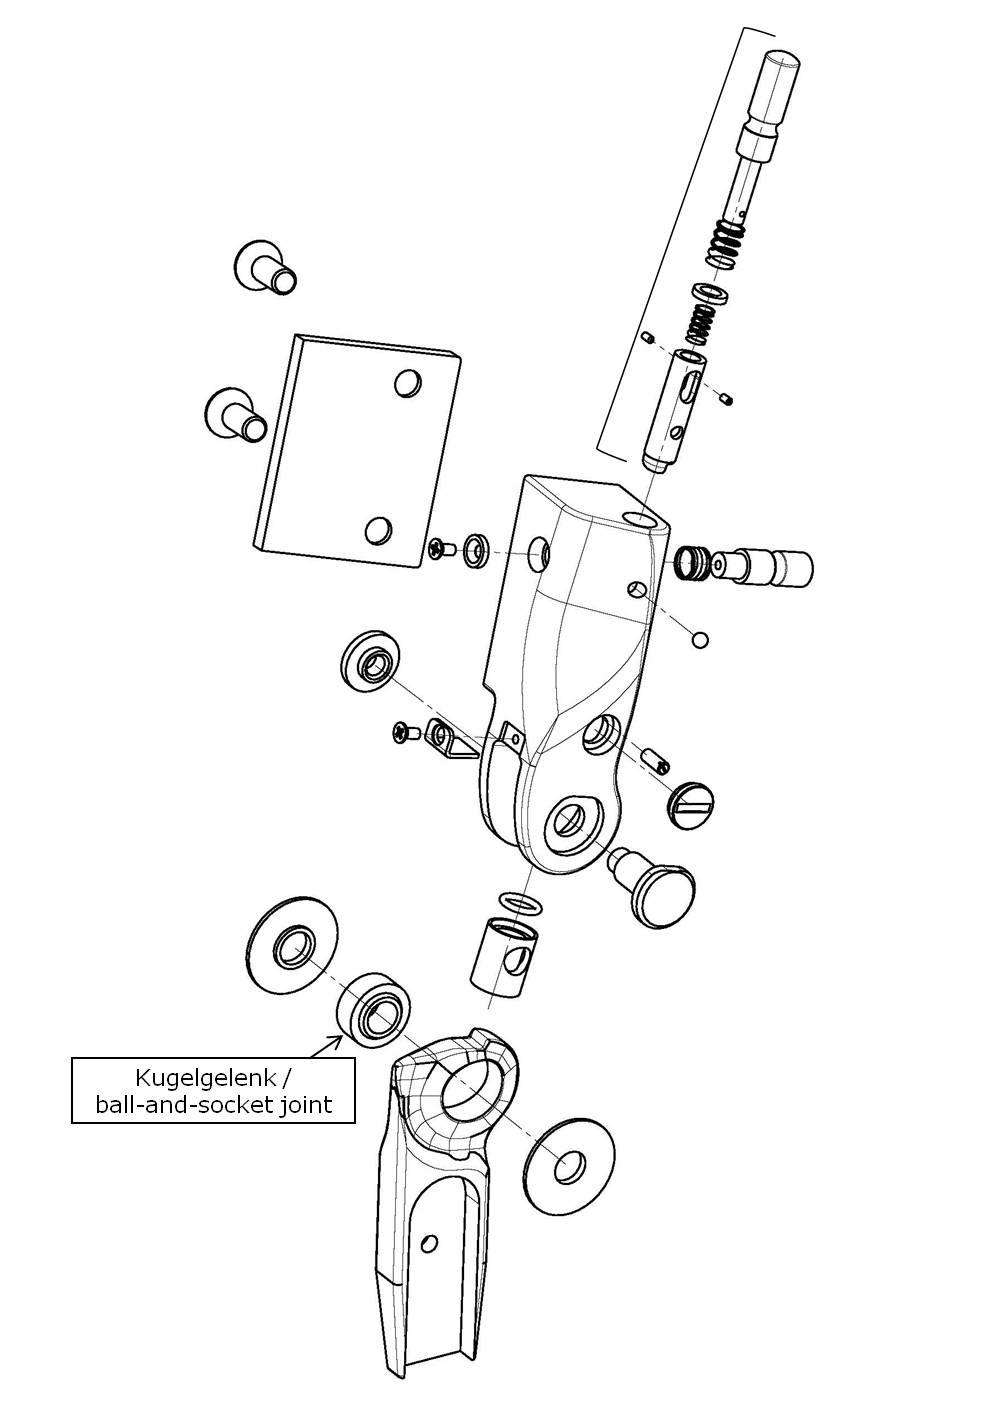 Kugelgelenk für das Salera preselect 3-D Hüftgelenk